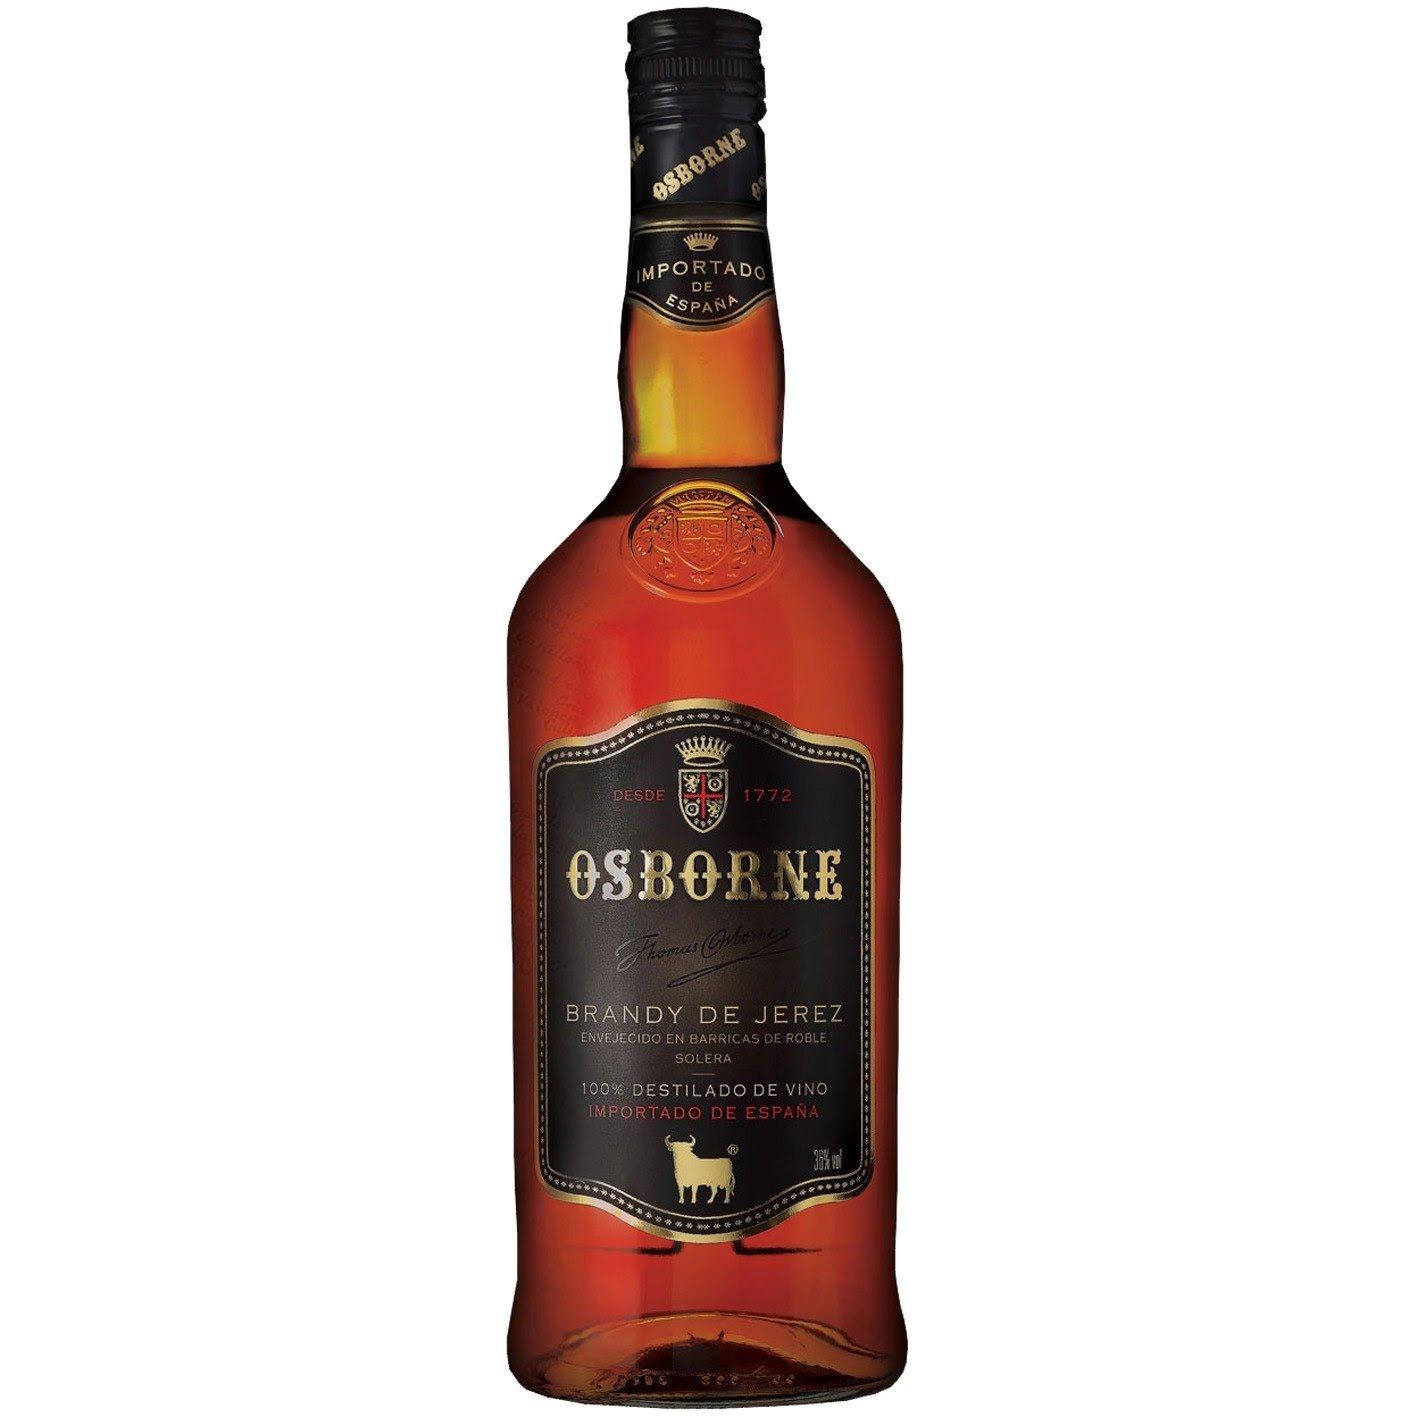 Brandy de Jerez Osborne - 700 ml  - Empório Pata Negra